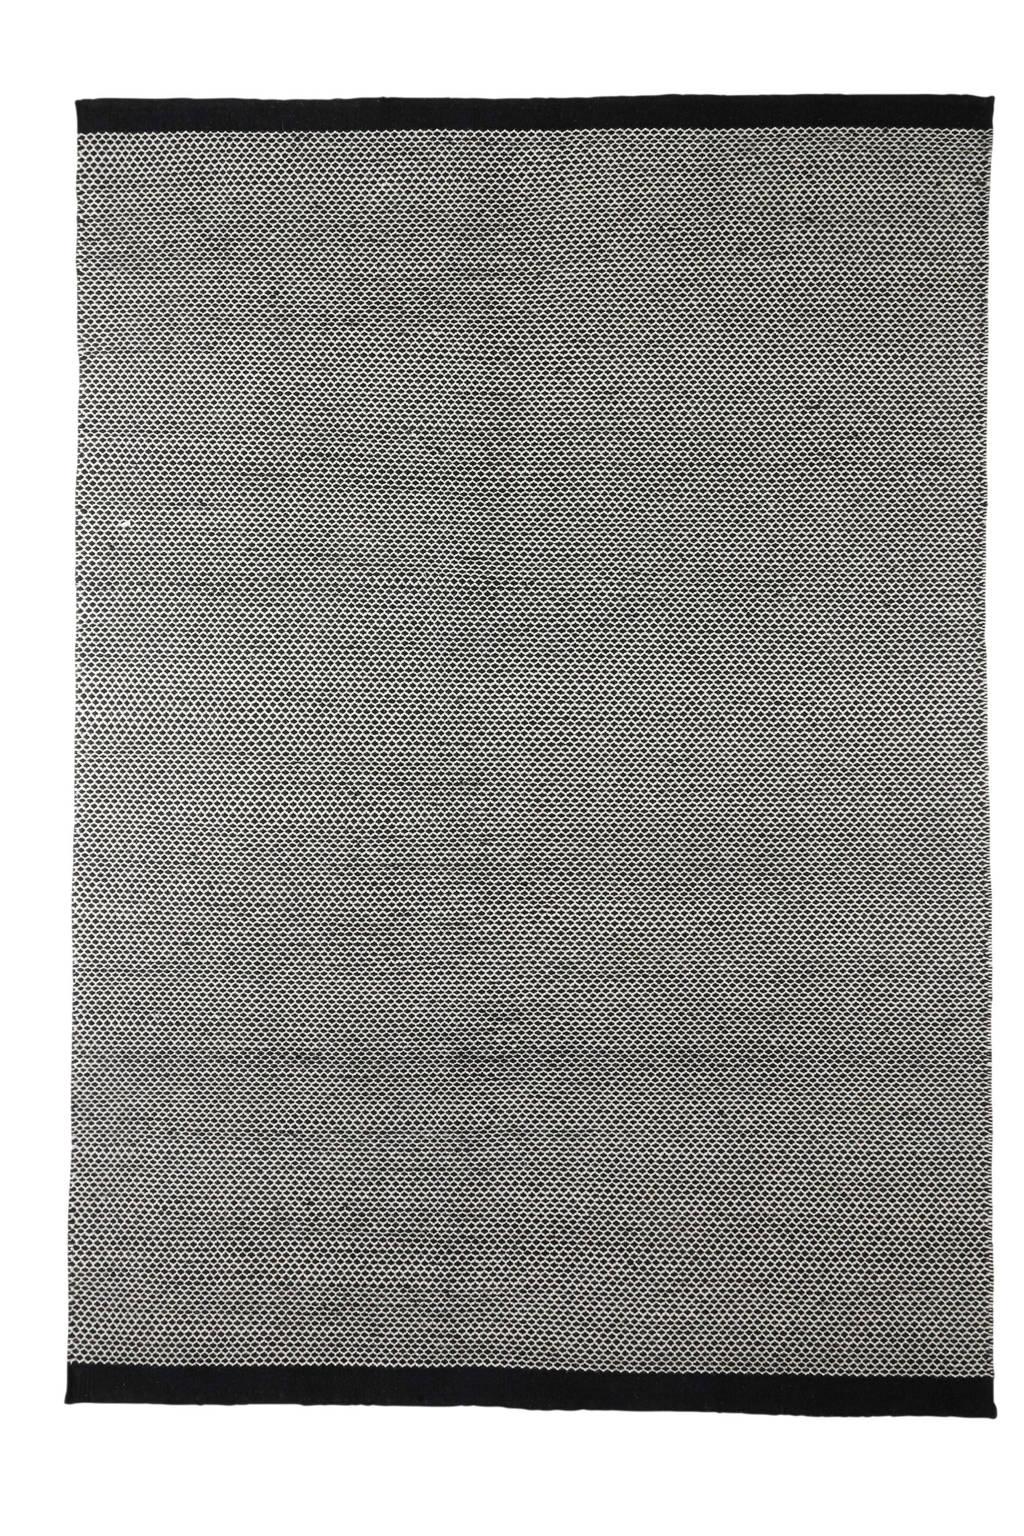 Brink & Campman vloerkleed Radja  (230x160 cm), Grijs